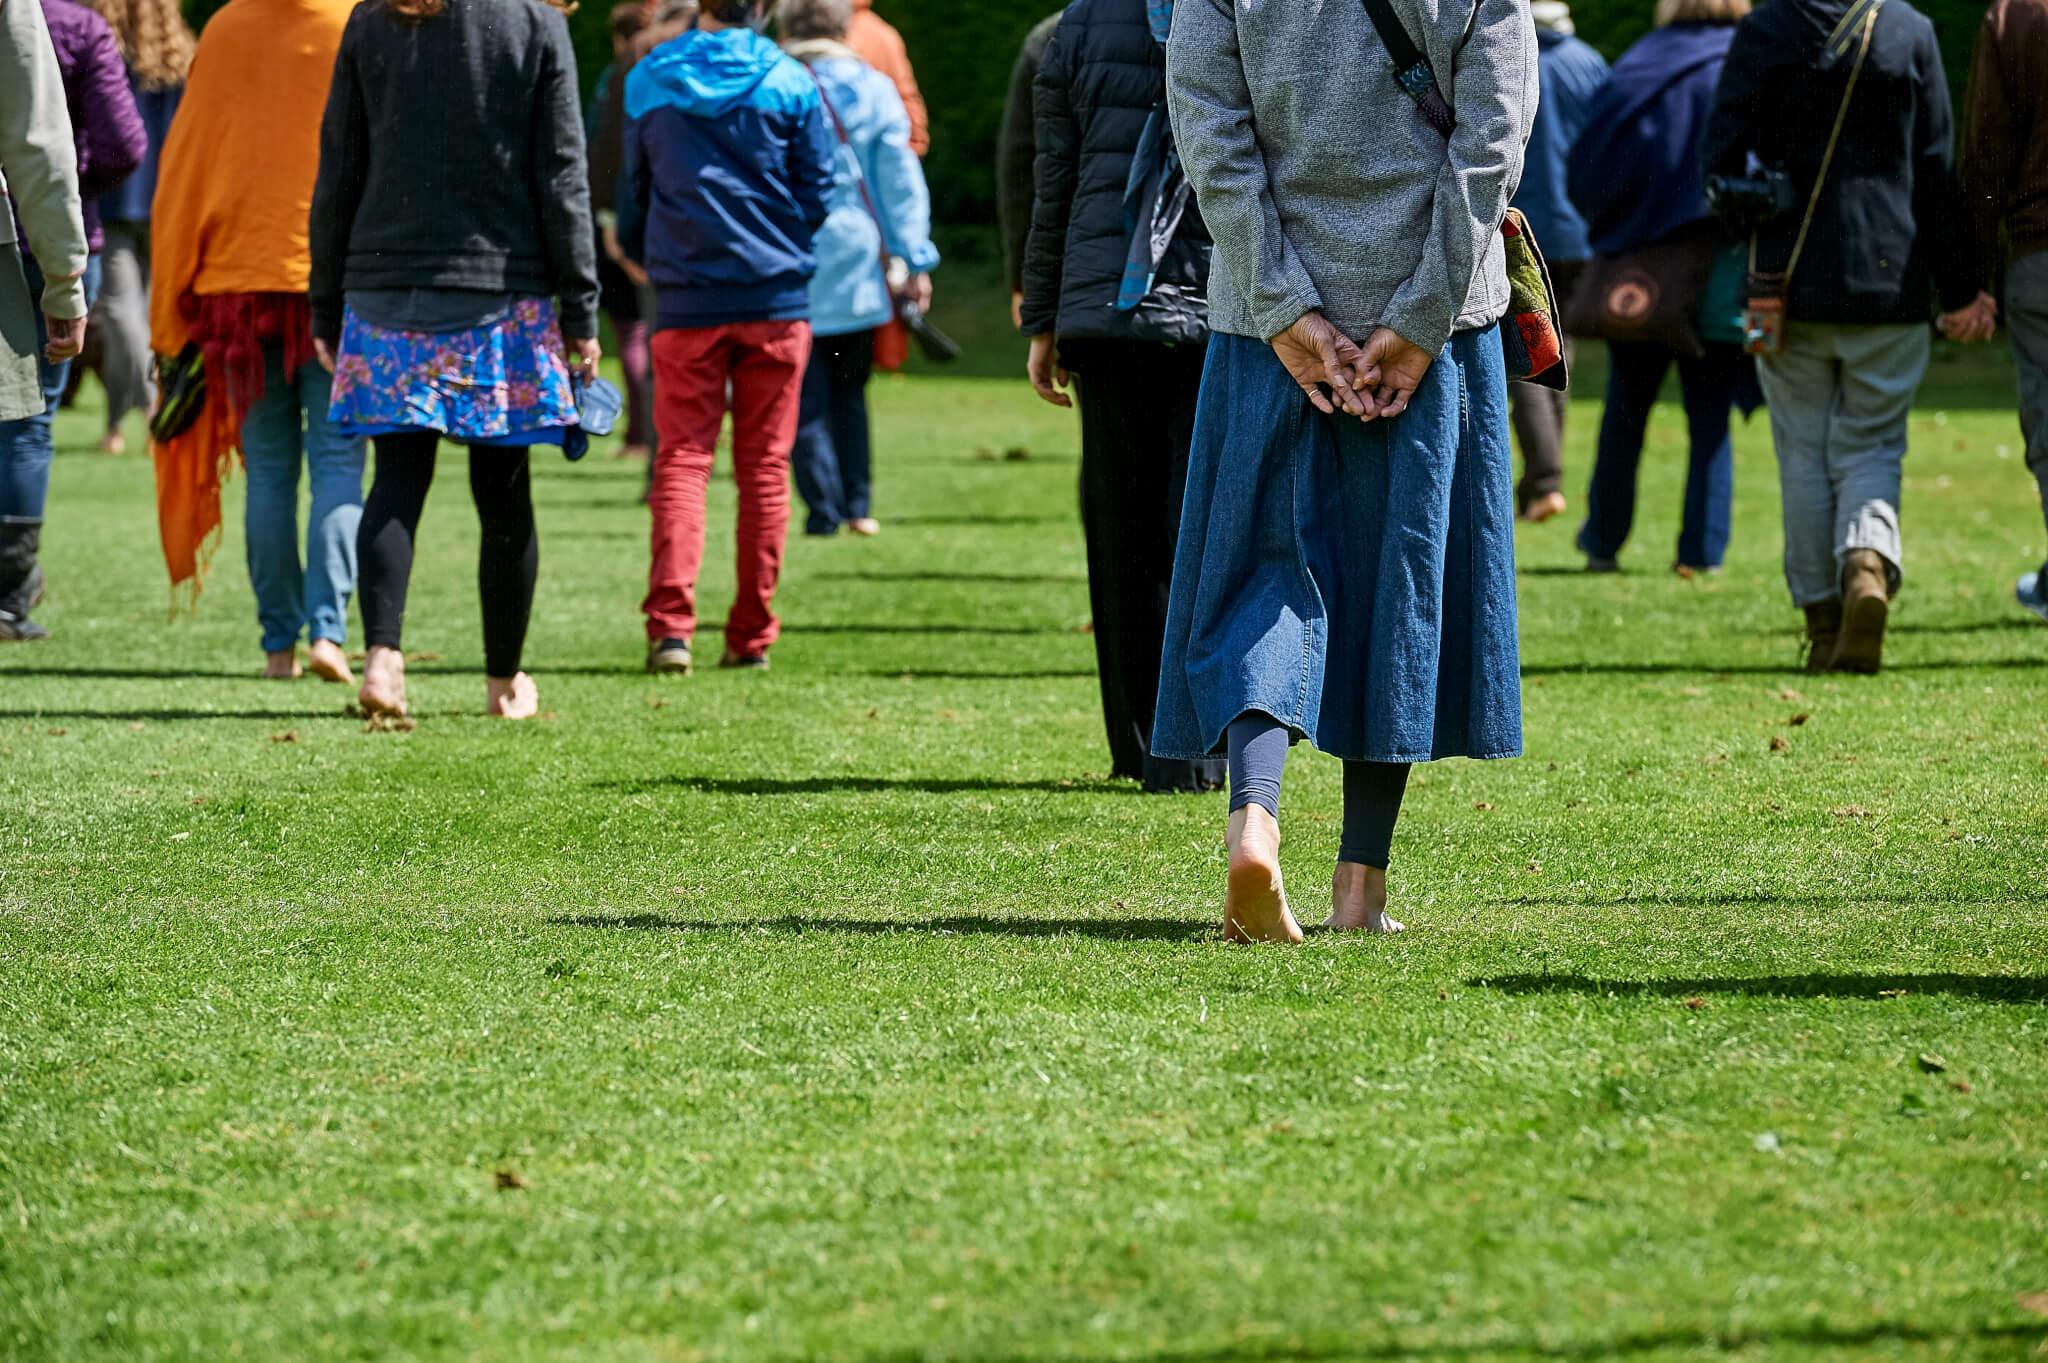 People practicing walking meditation